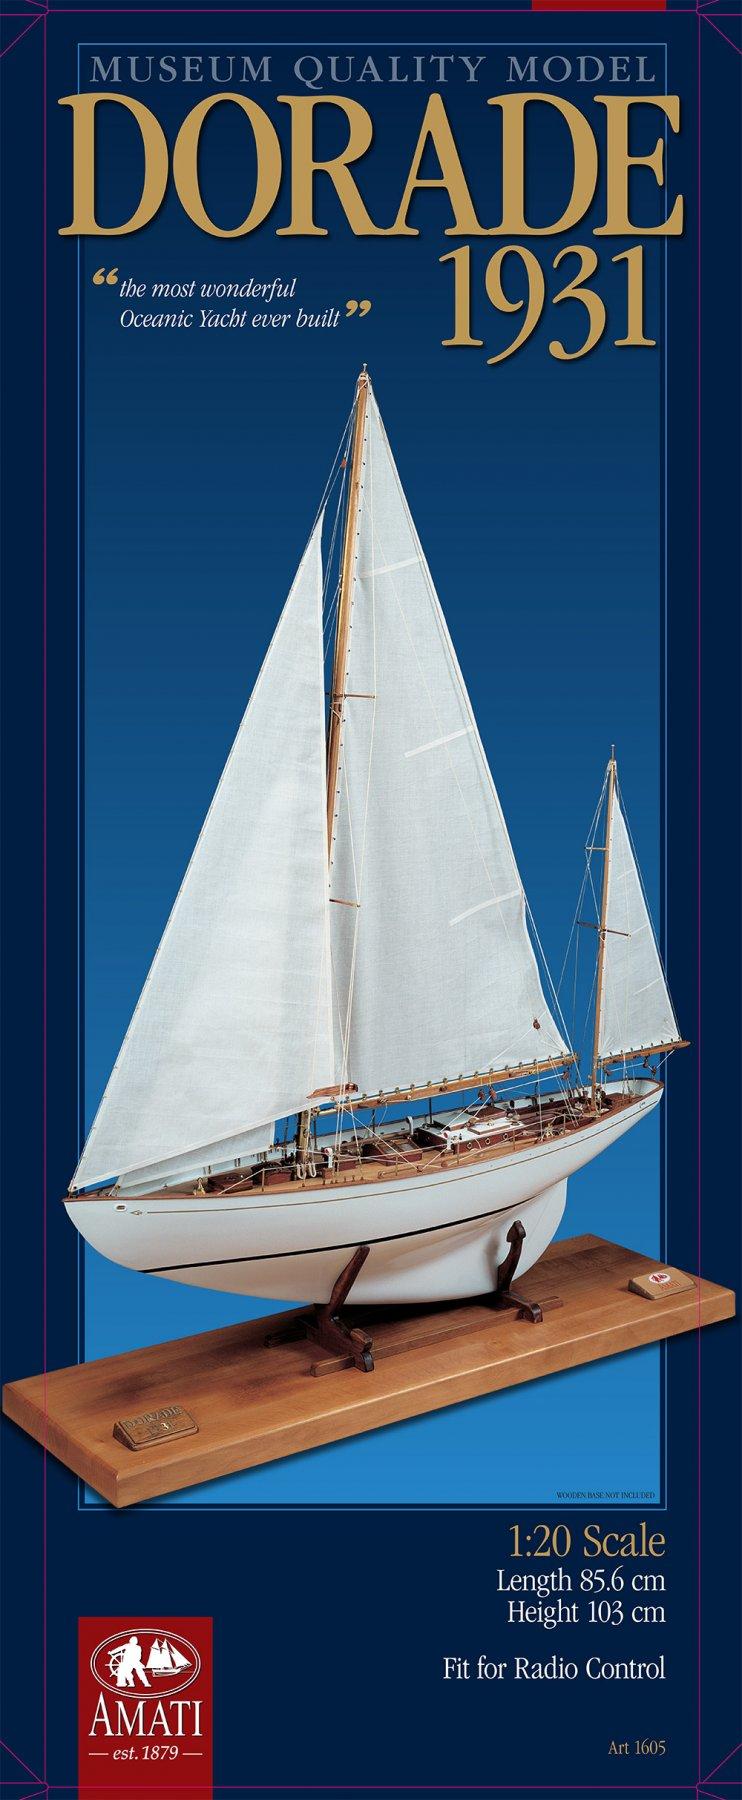 1:20 Dorade, 1931 - Amati - REVIEWS: Model kits - Nautical Research